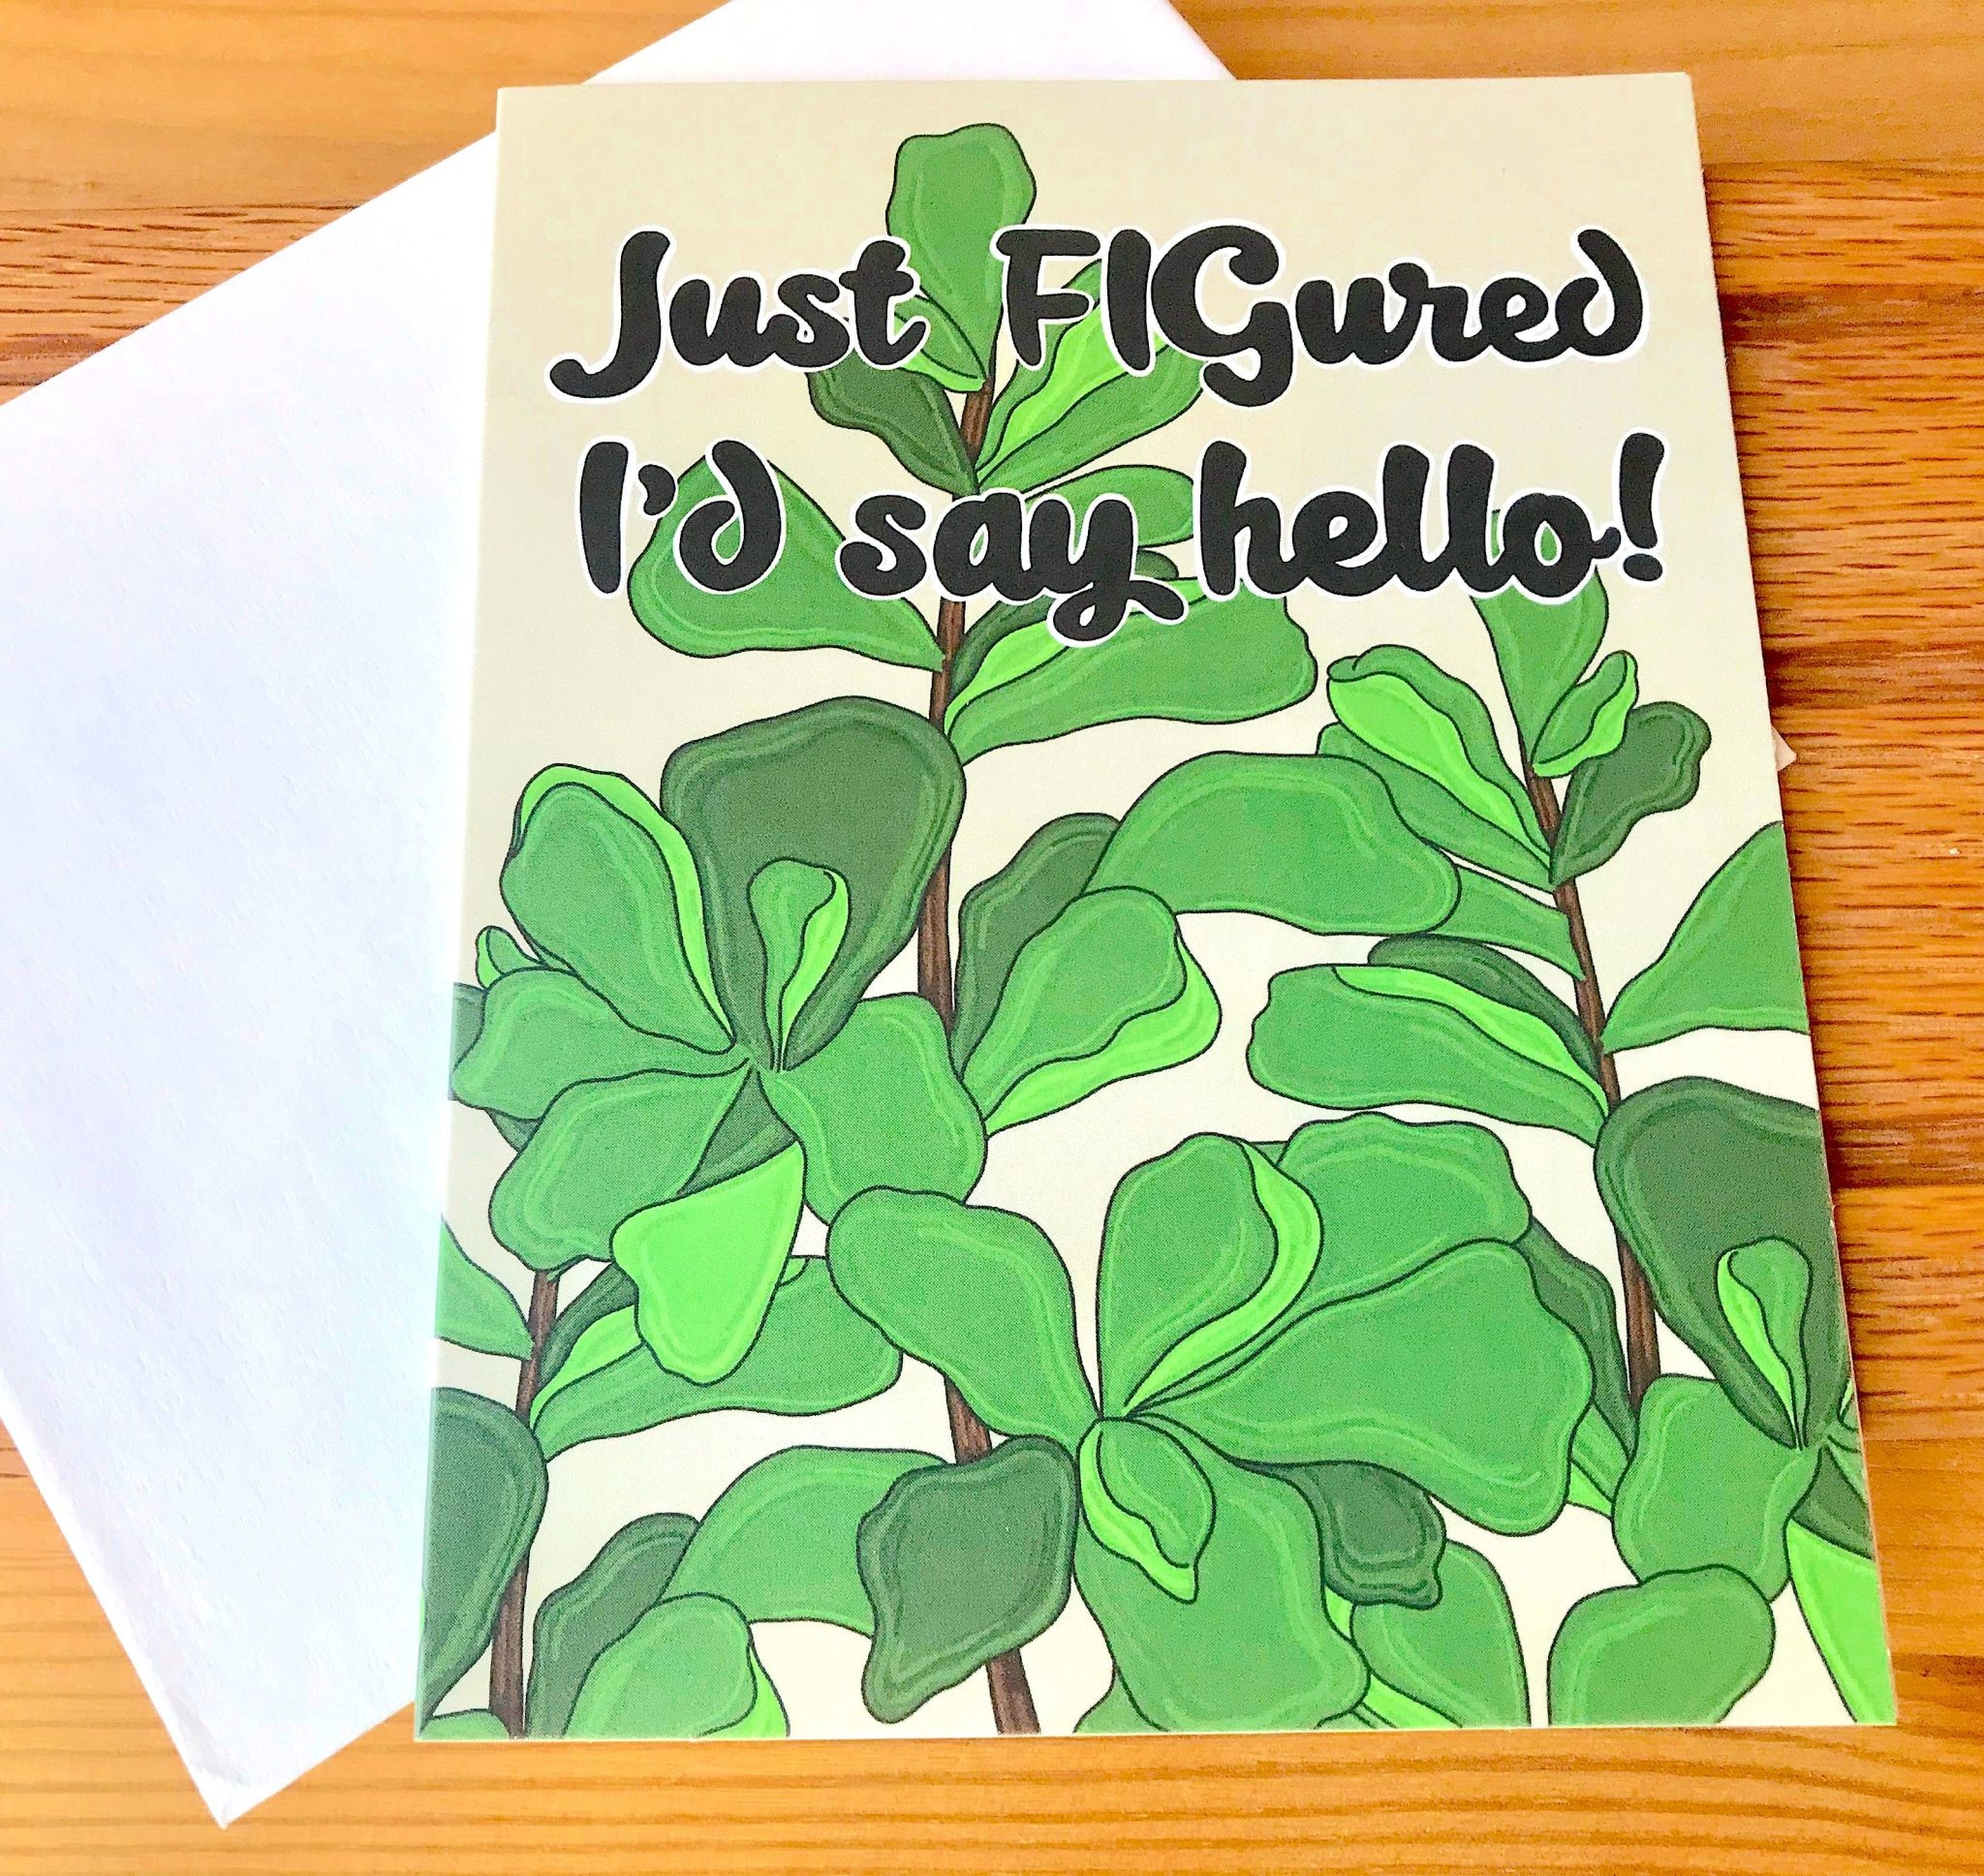 Fiber and Gloss FIGured I'd Say Hello Greeting Card